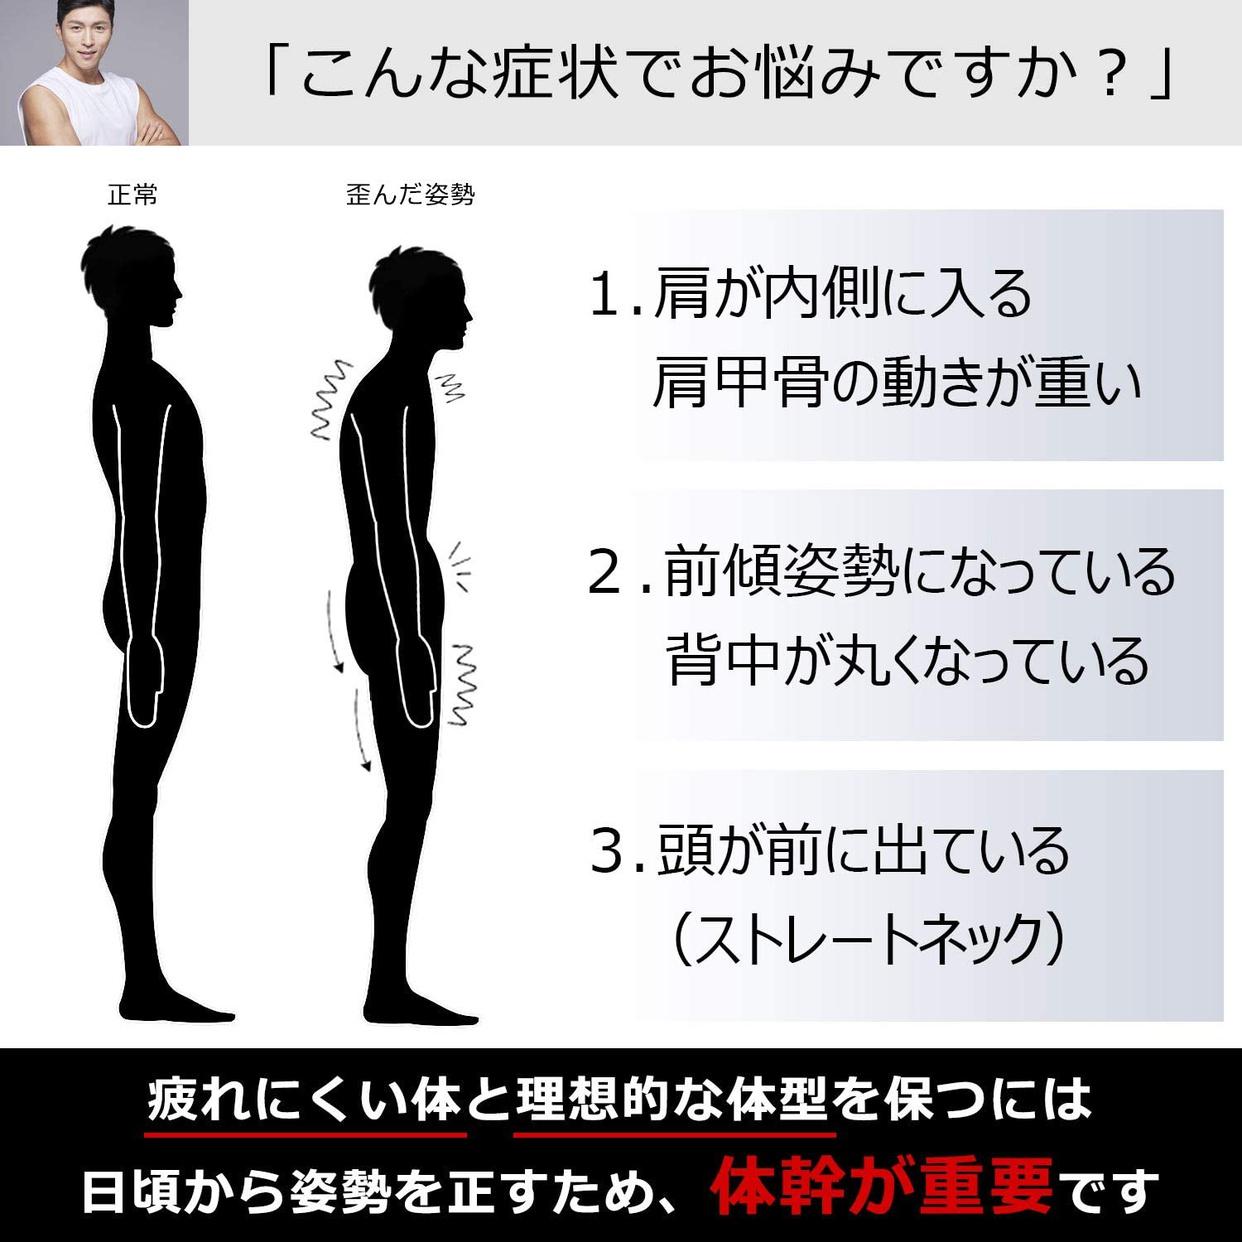 IWAMA HOSEI(イワマホウセイ) 姿勢サポーターの商品画像3